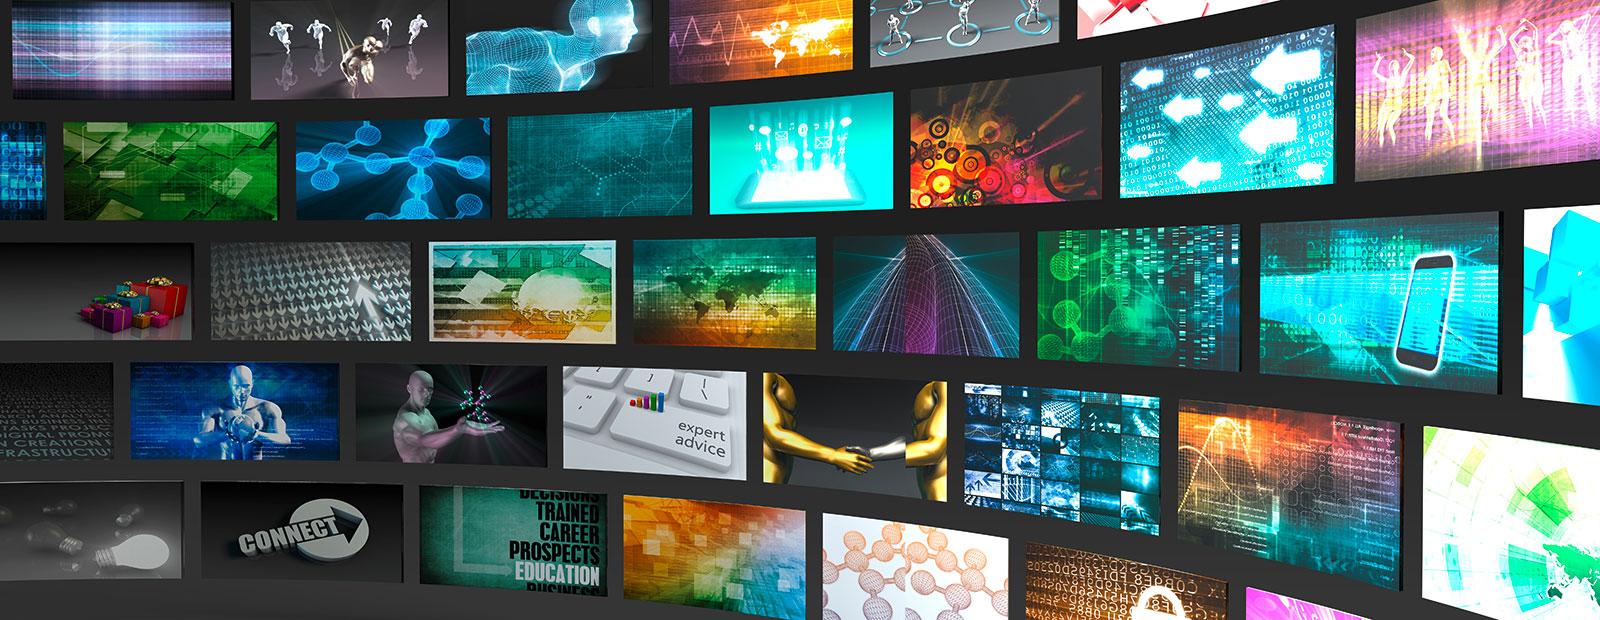 videowall eurofunk